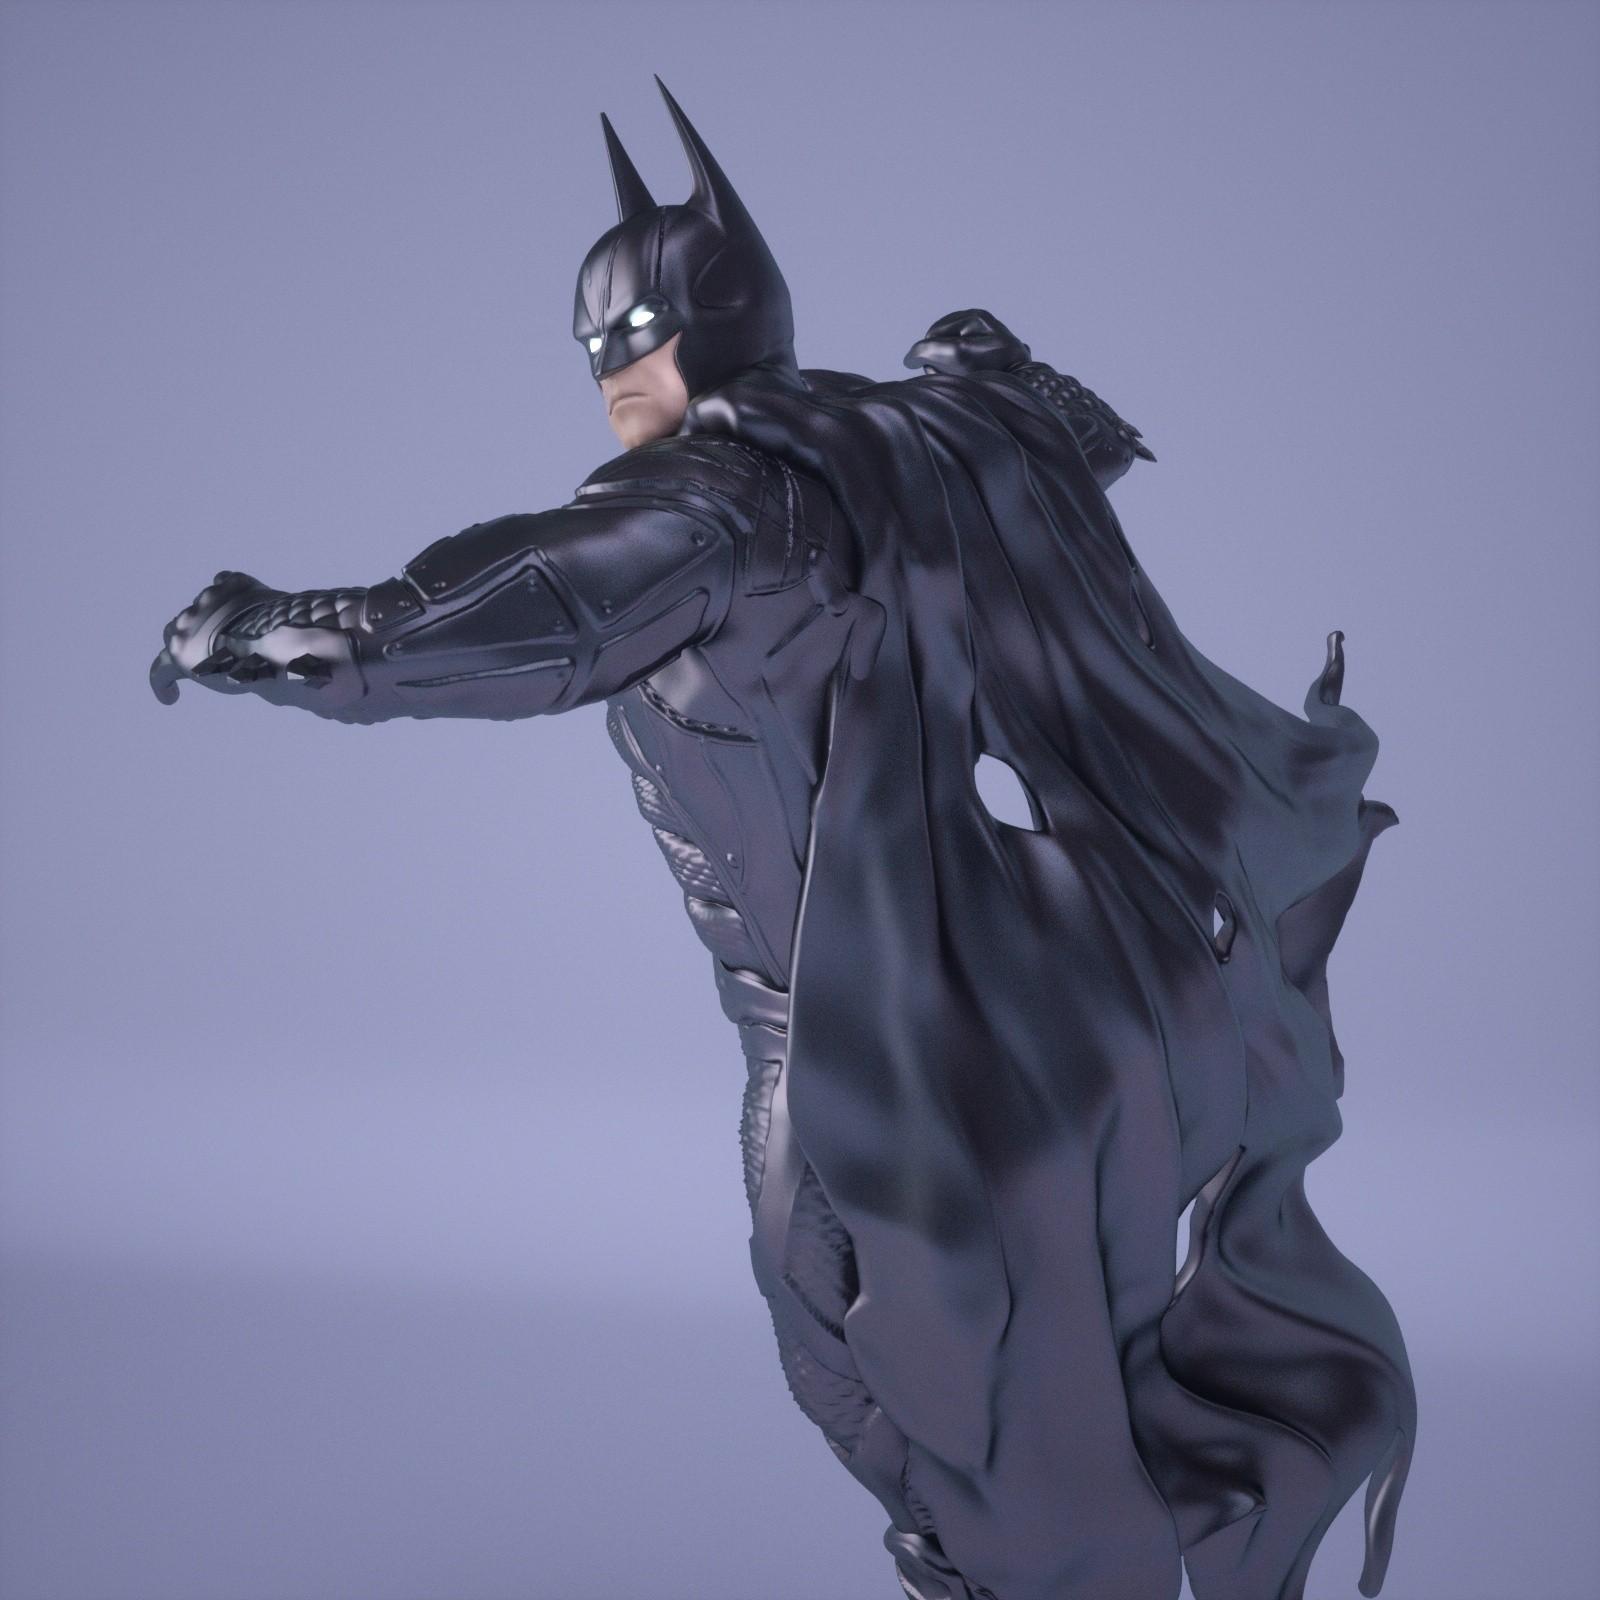 17.jpg Download OBJ file BATMAN Battle Pose • 3D print template, tolgaaxu